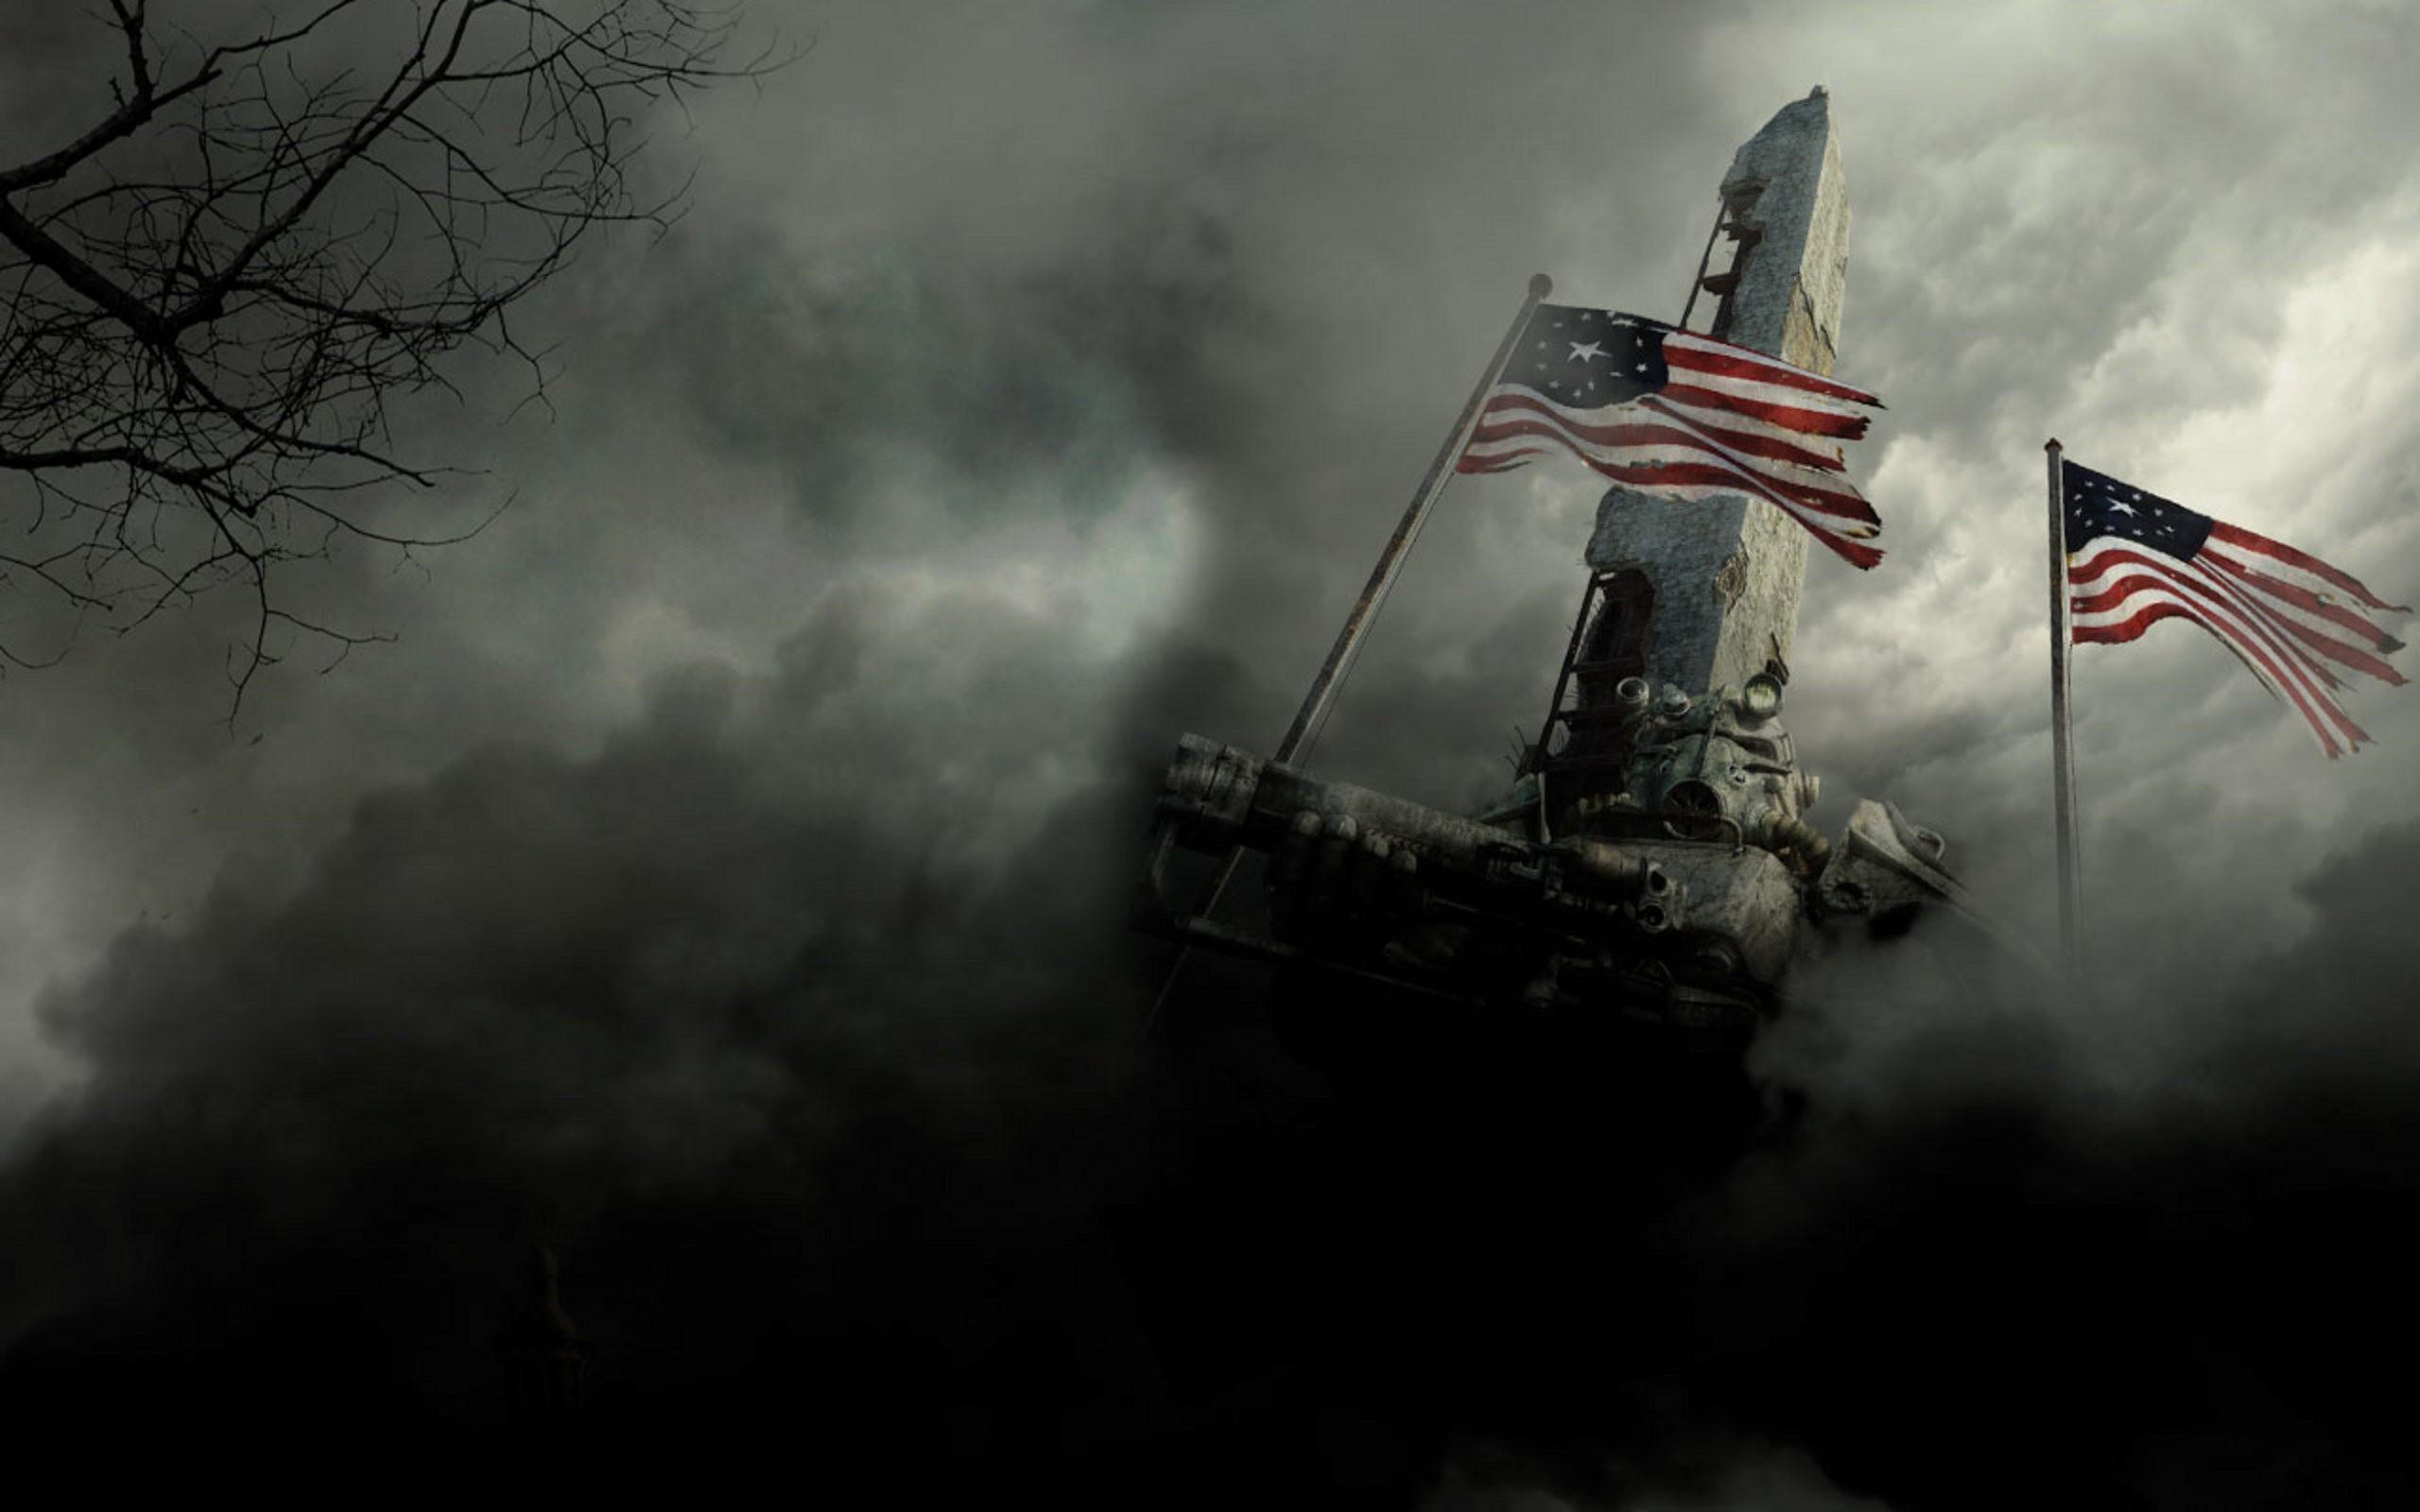 Vintage American Flag Background 1 Download Free High Resolution